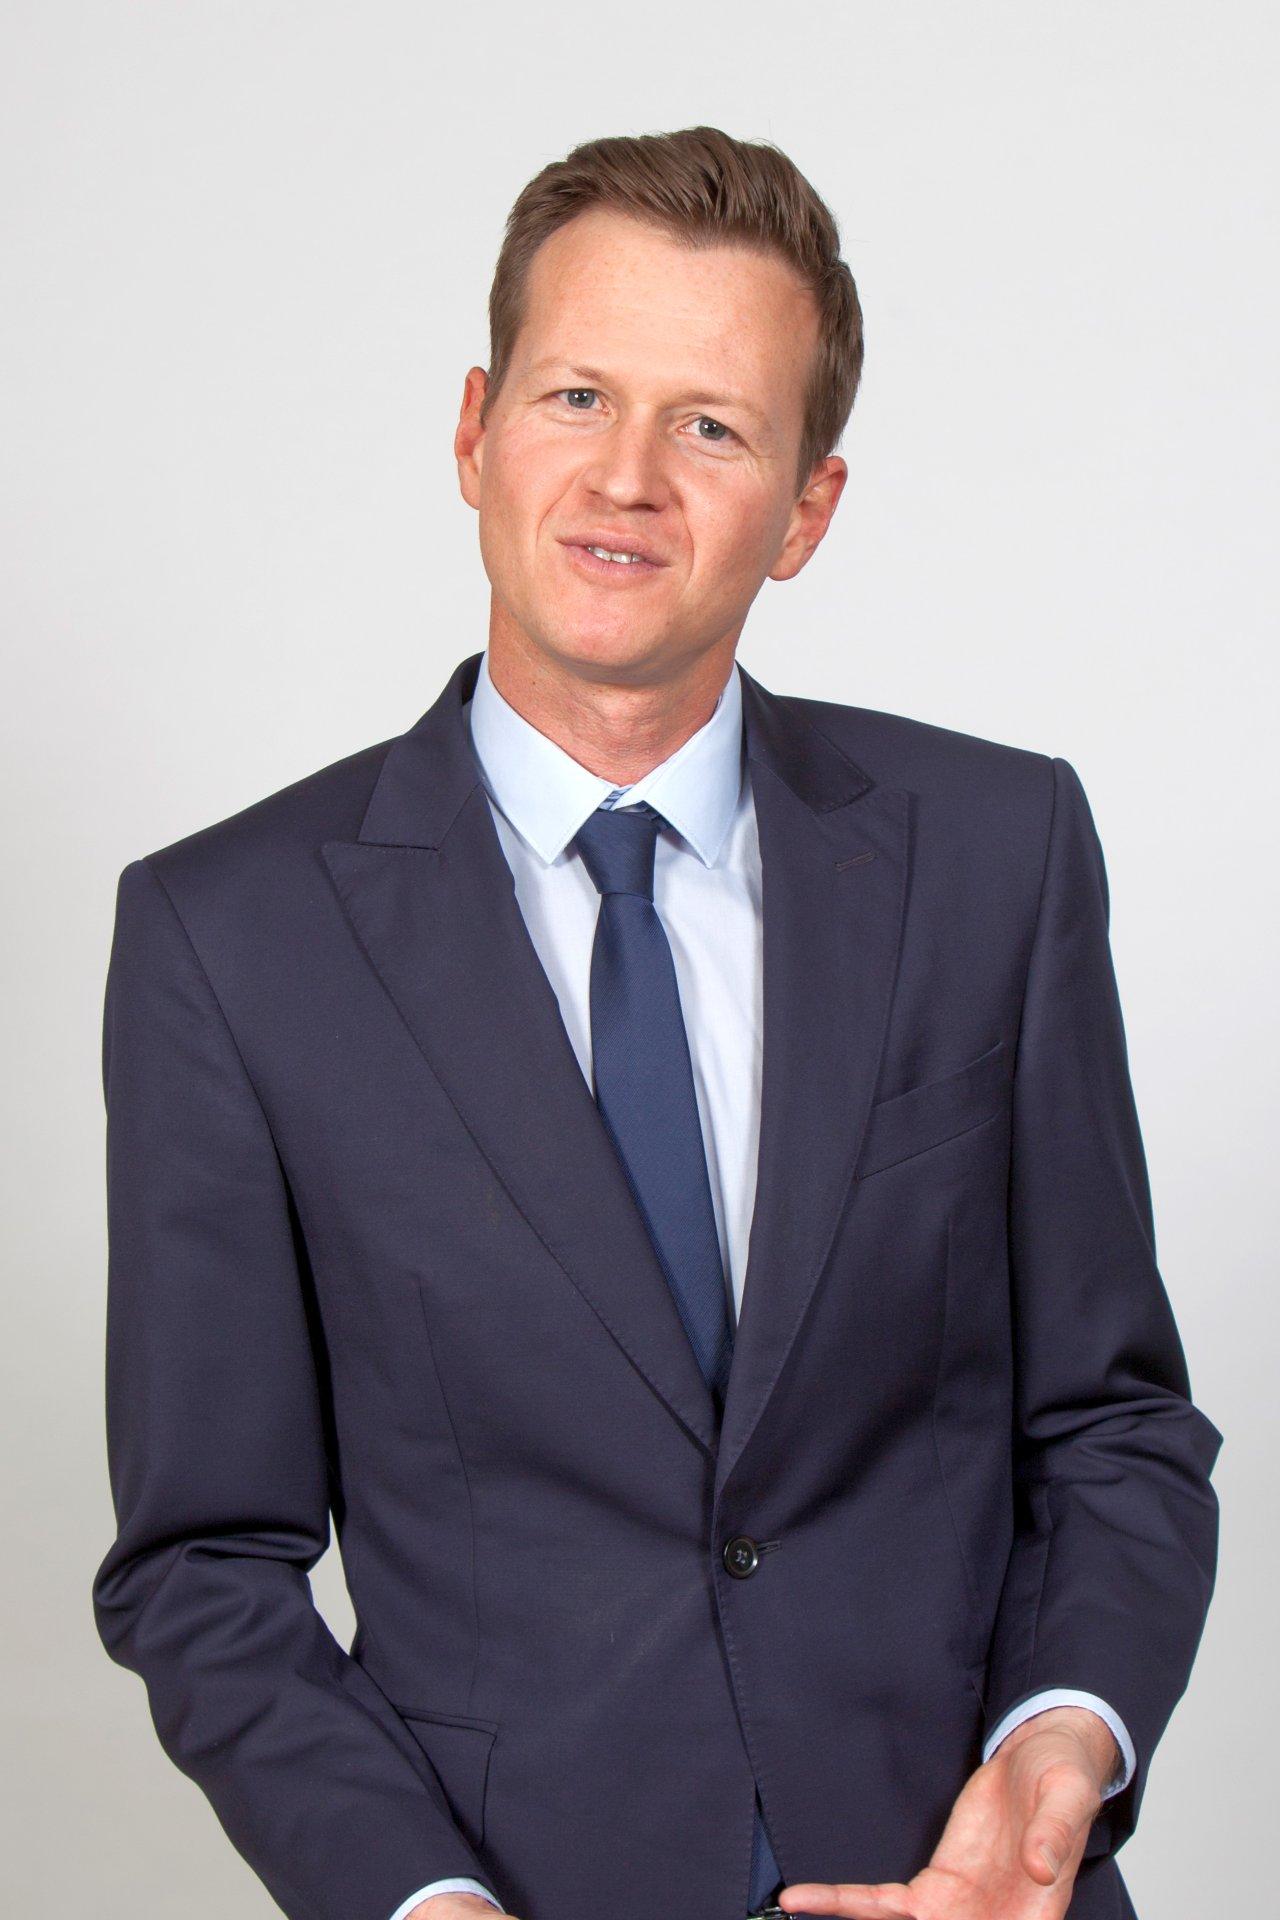 Rechtsanwalt Dominic Kaiser | Kaiser Rechtsanwälte, Ingelheim am Rhein